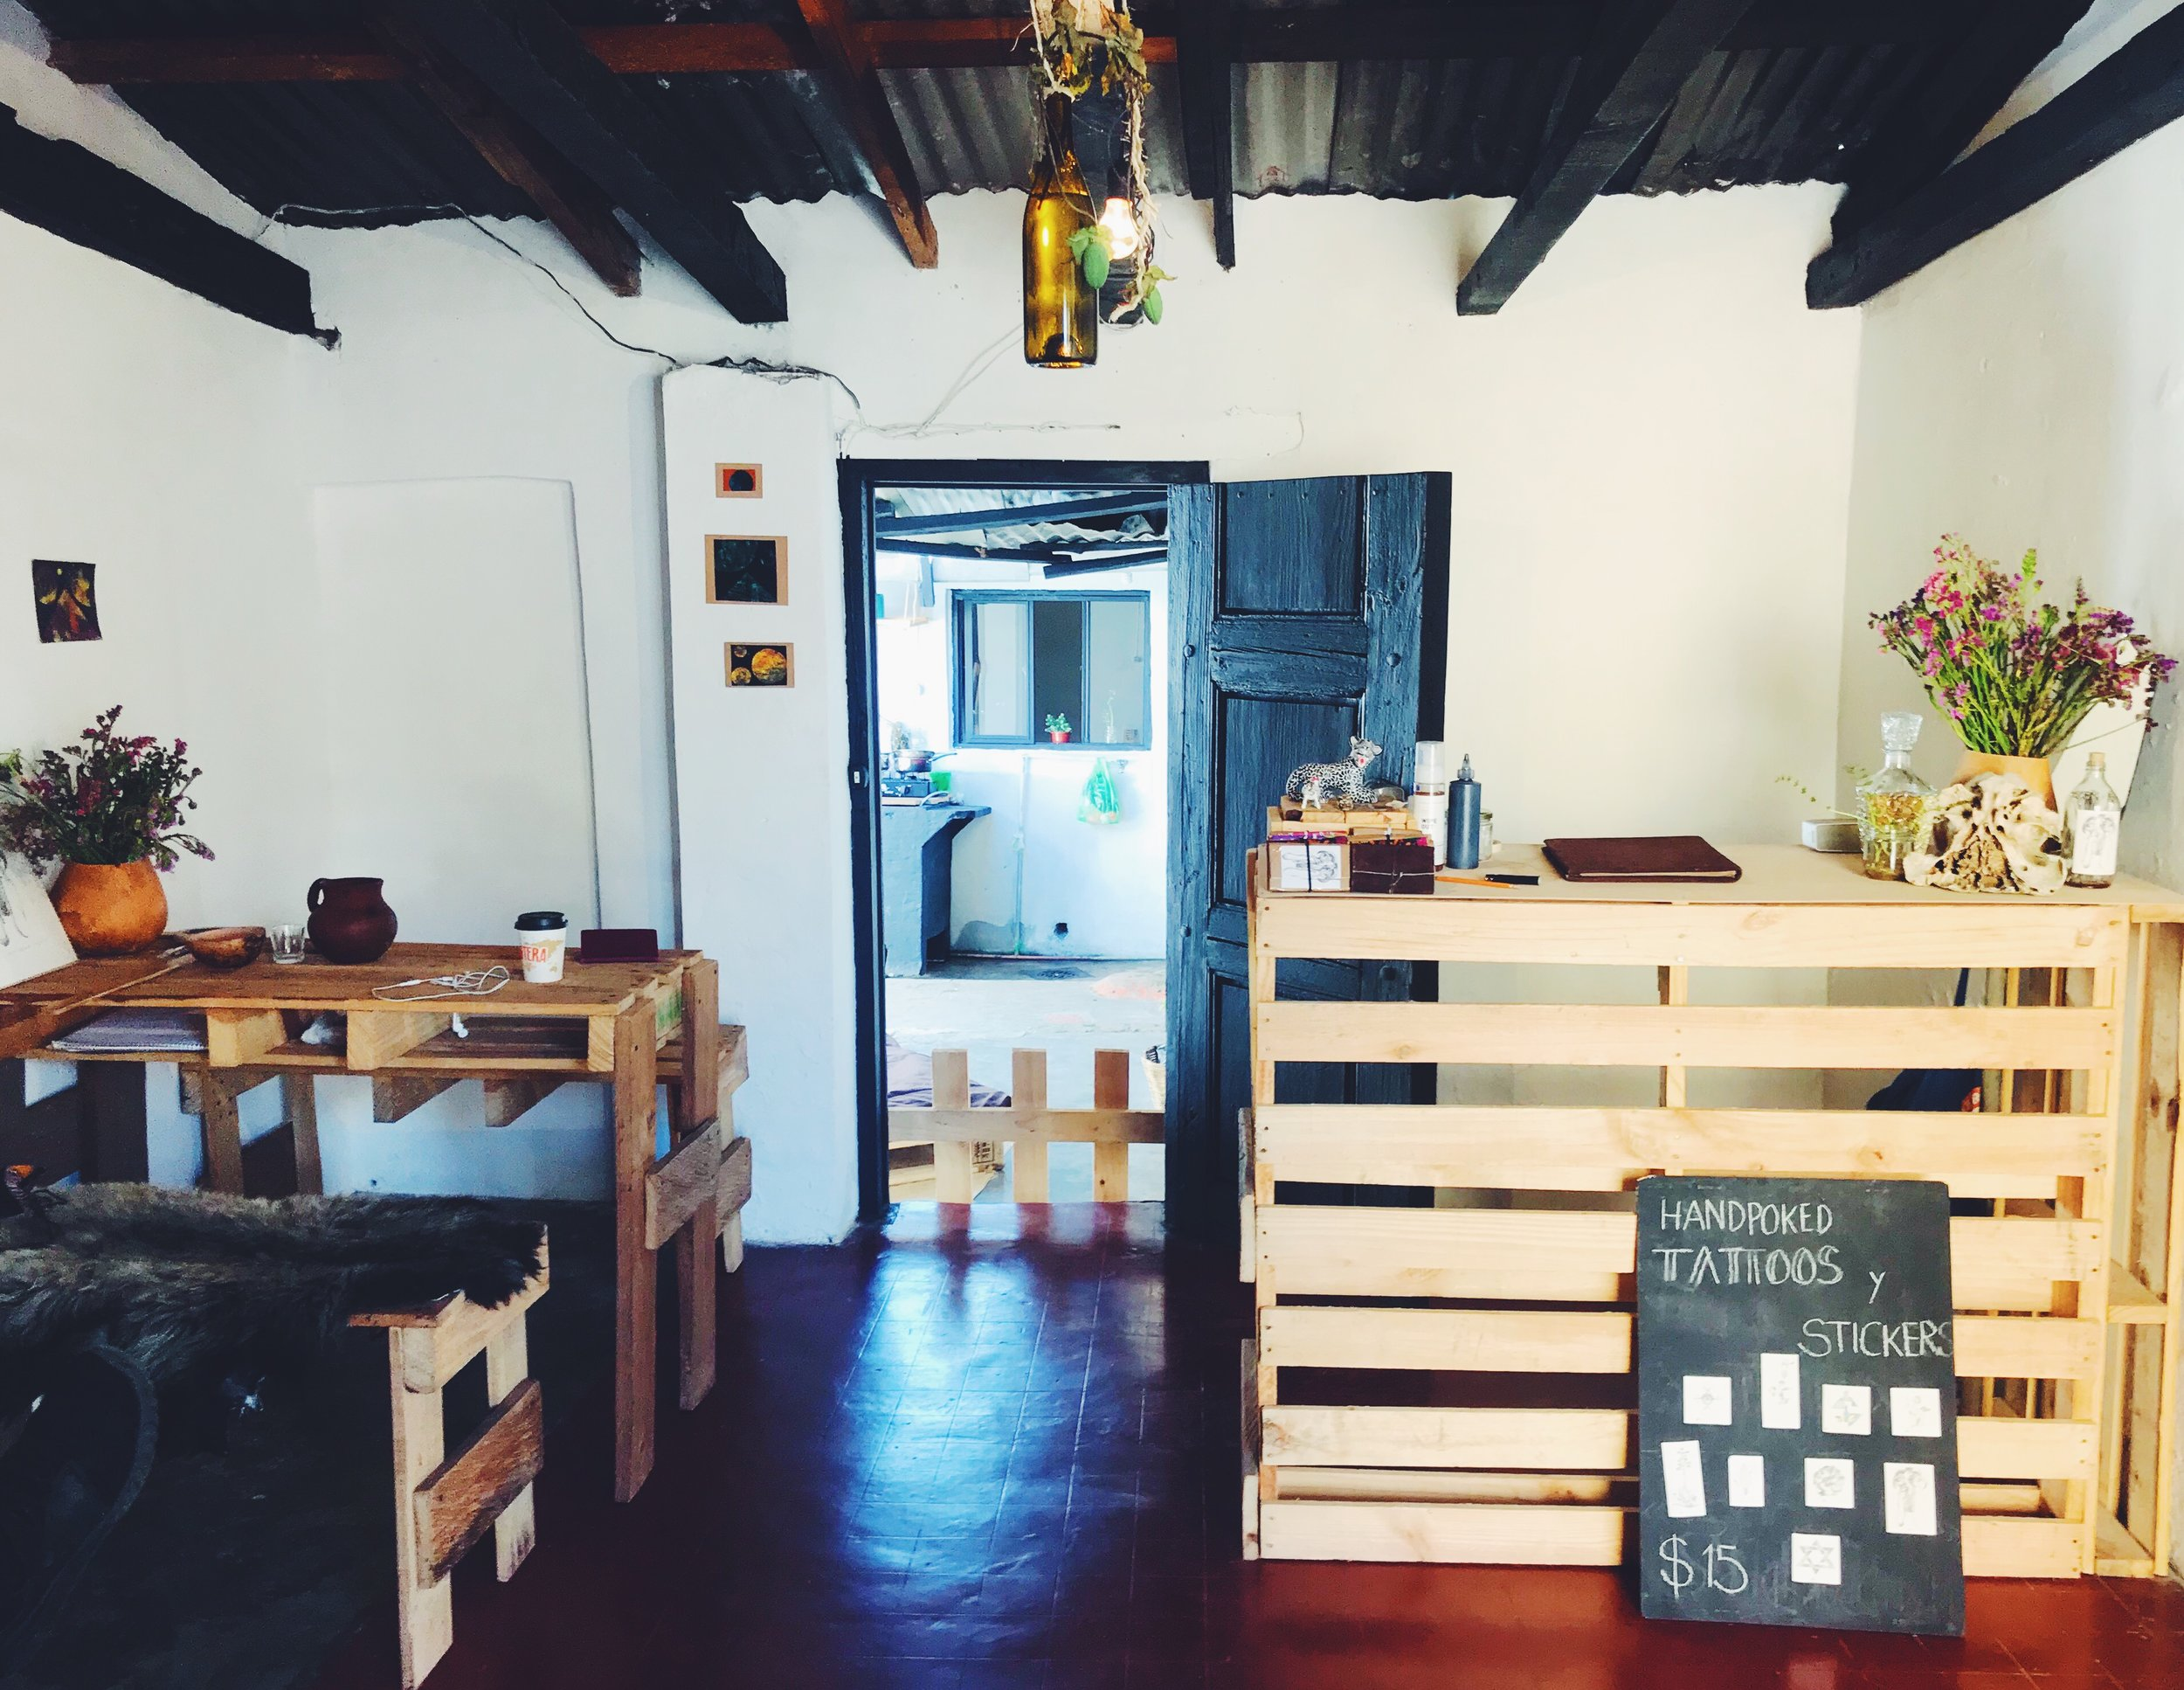 Jenny's tattoo studio in San Cristobal de Las Casas, Mexico